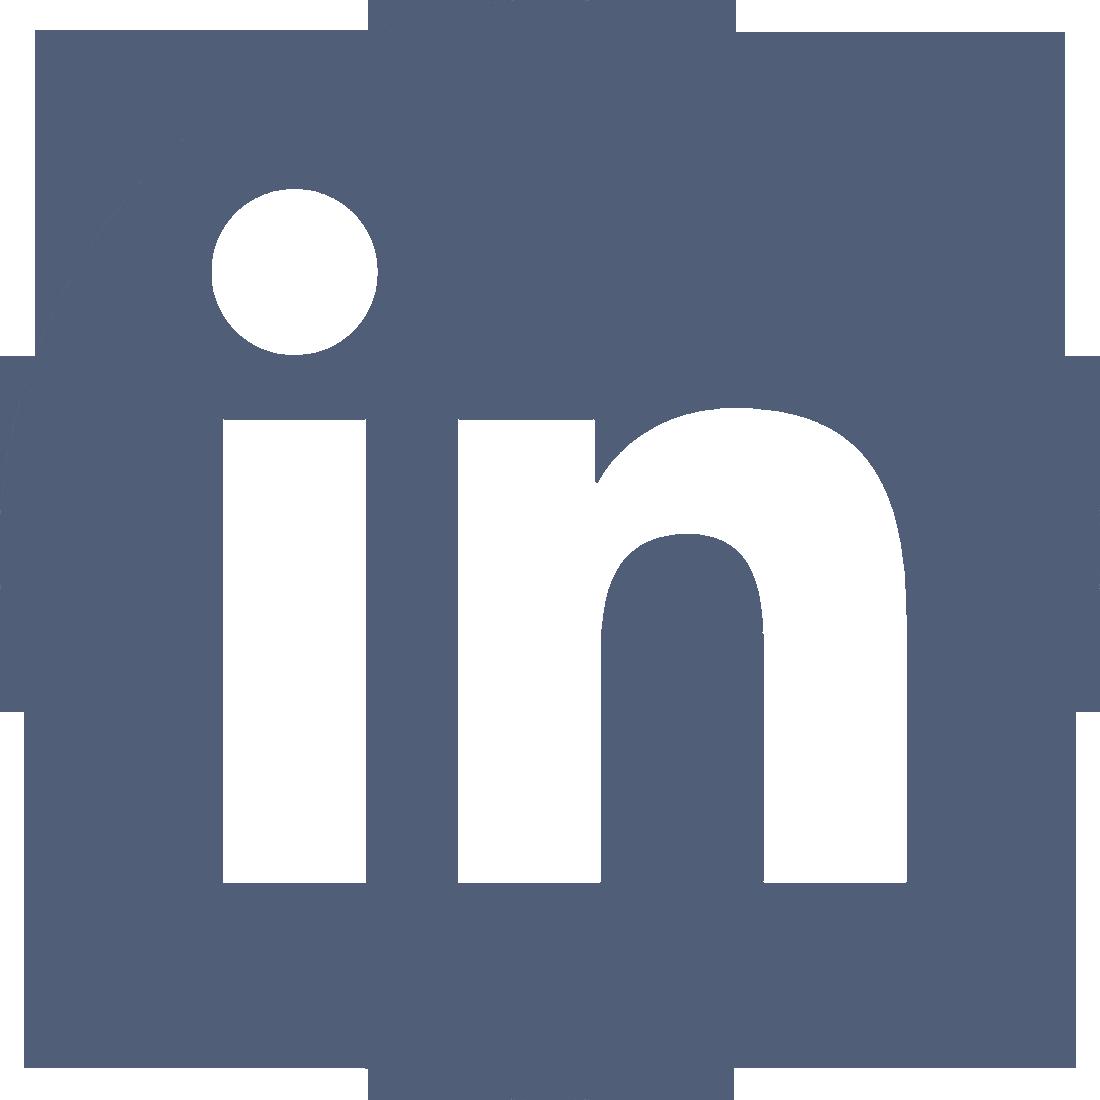 1100x1100 Linkedin Logo Vector Png Free Download